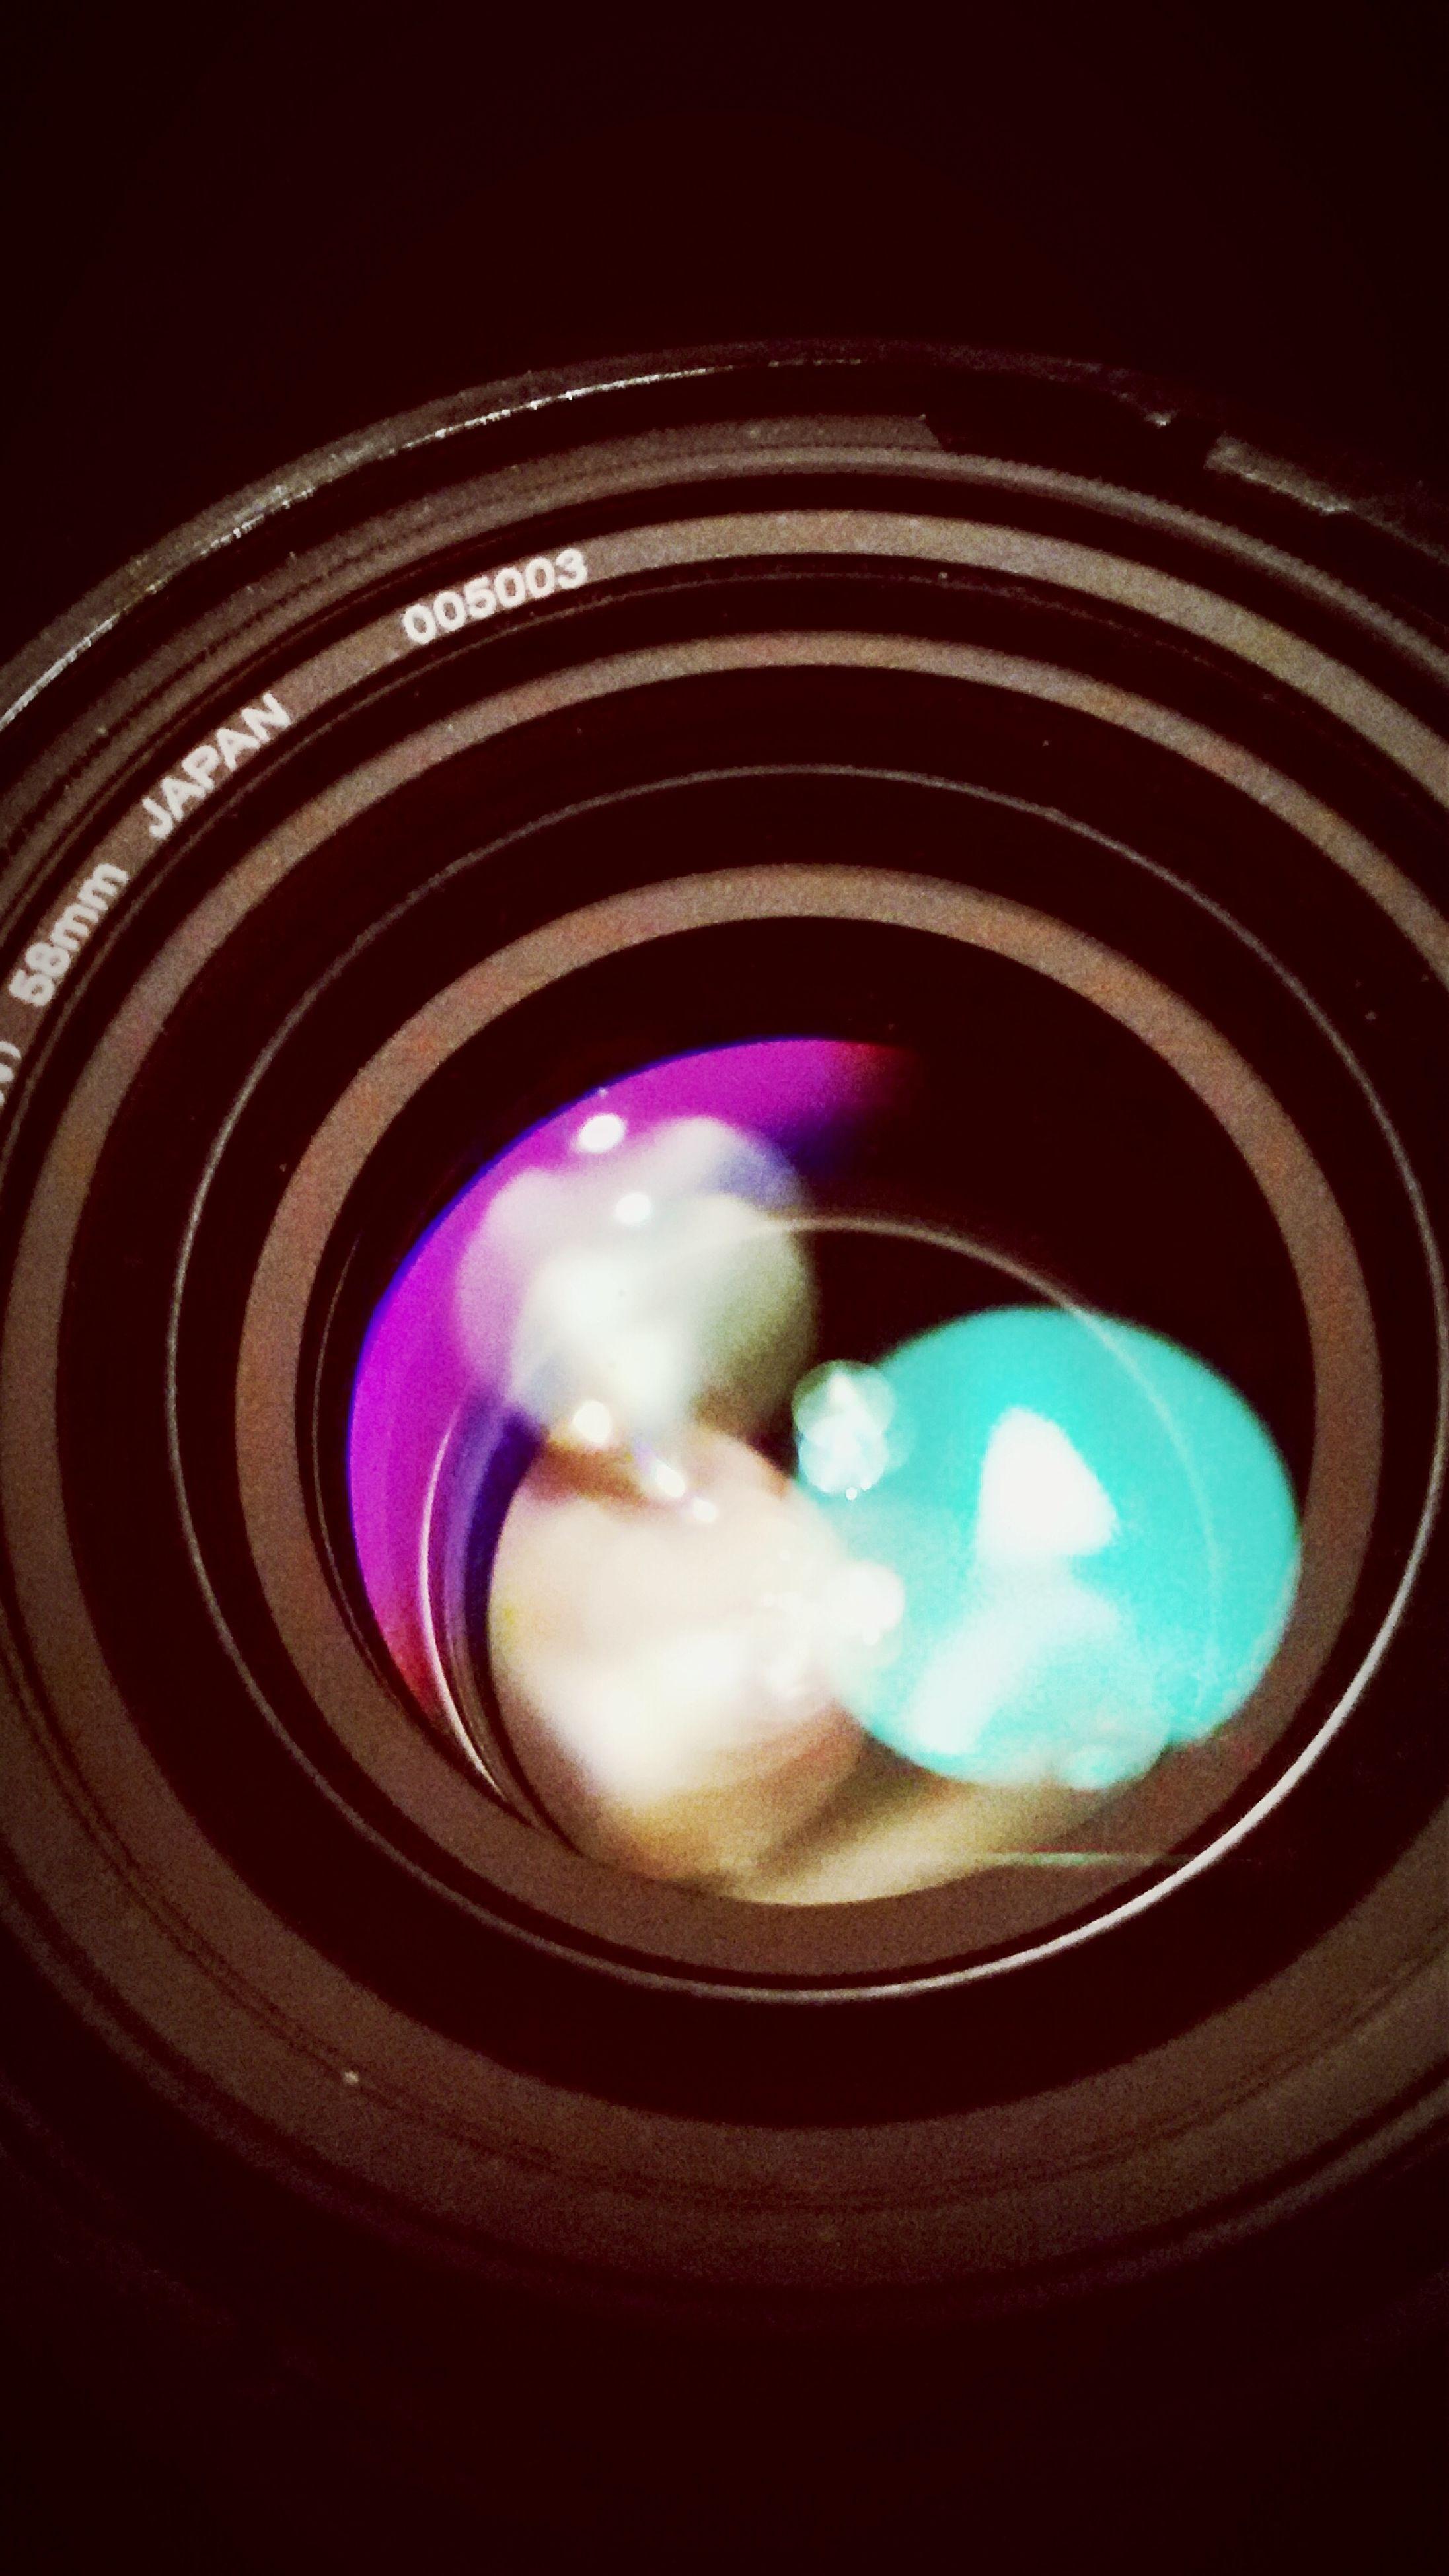 illuminated, night, glowing, circle, black background, close-up, indoors, multi colored, long exposure, studio shot, light - natural phenomenon, burning, lighting equipment, dark, motion, heat - temperature, no people, blue, fire - natural phenomenon, flame